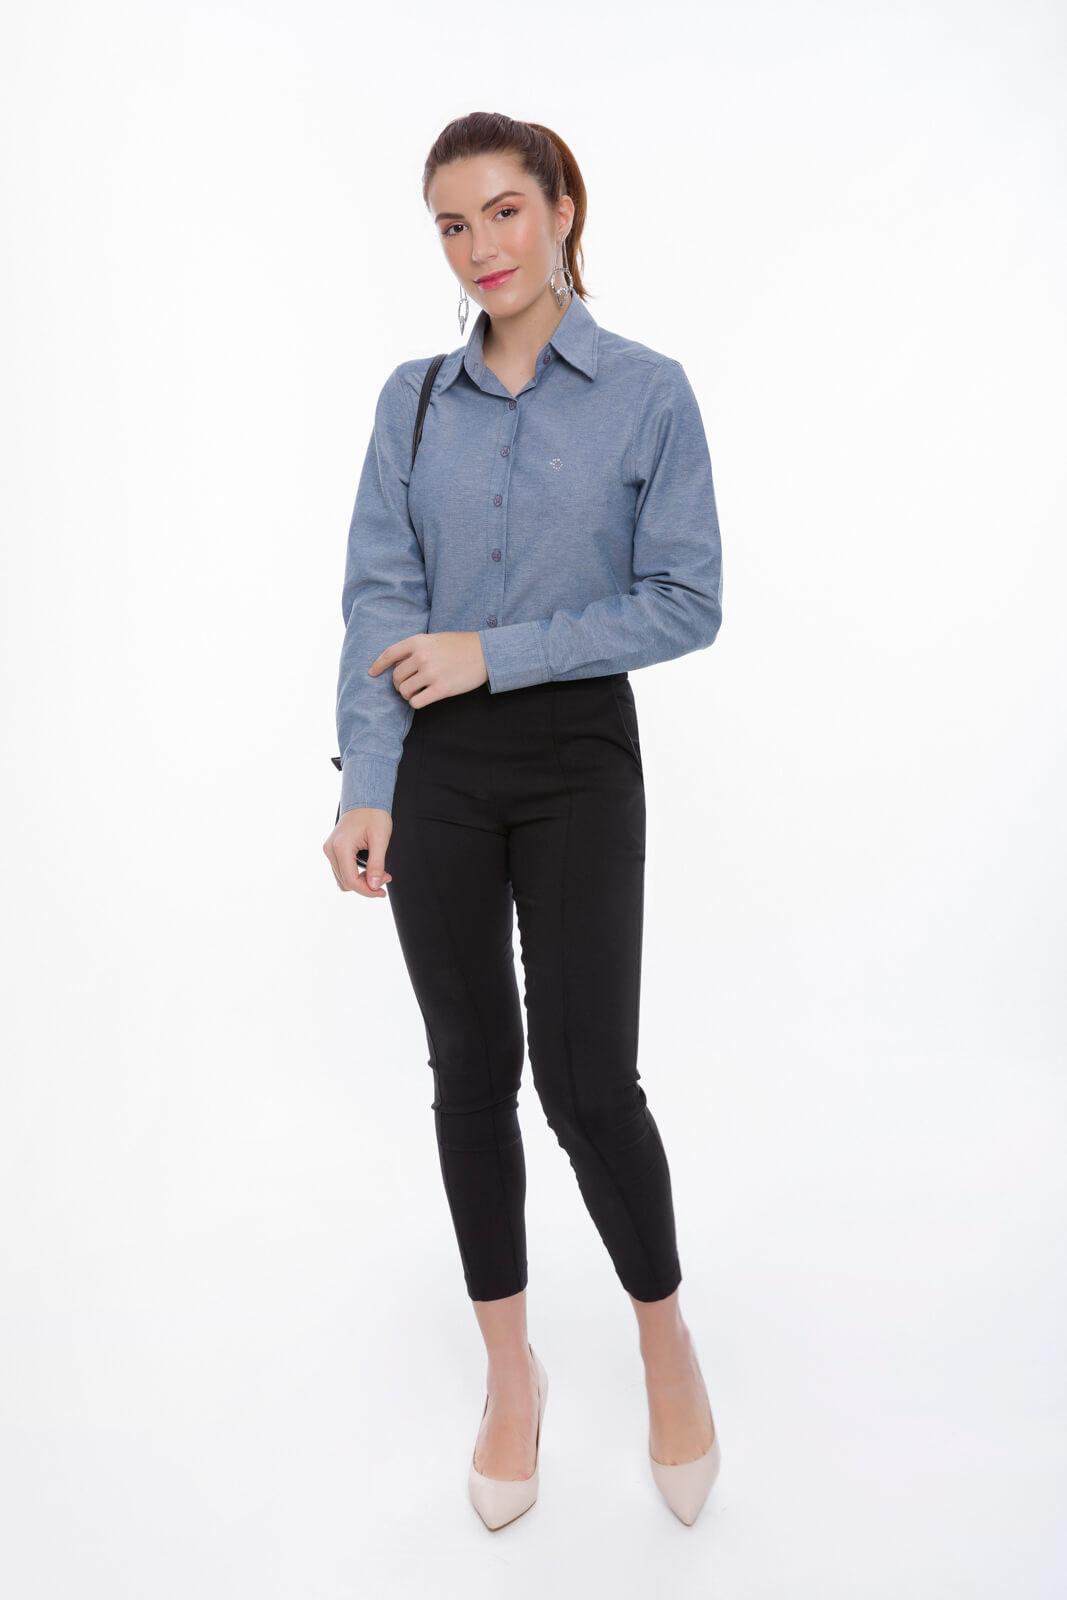 Camisa Social Feminina Olimpo Lisa Manga Longa Não Amassa